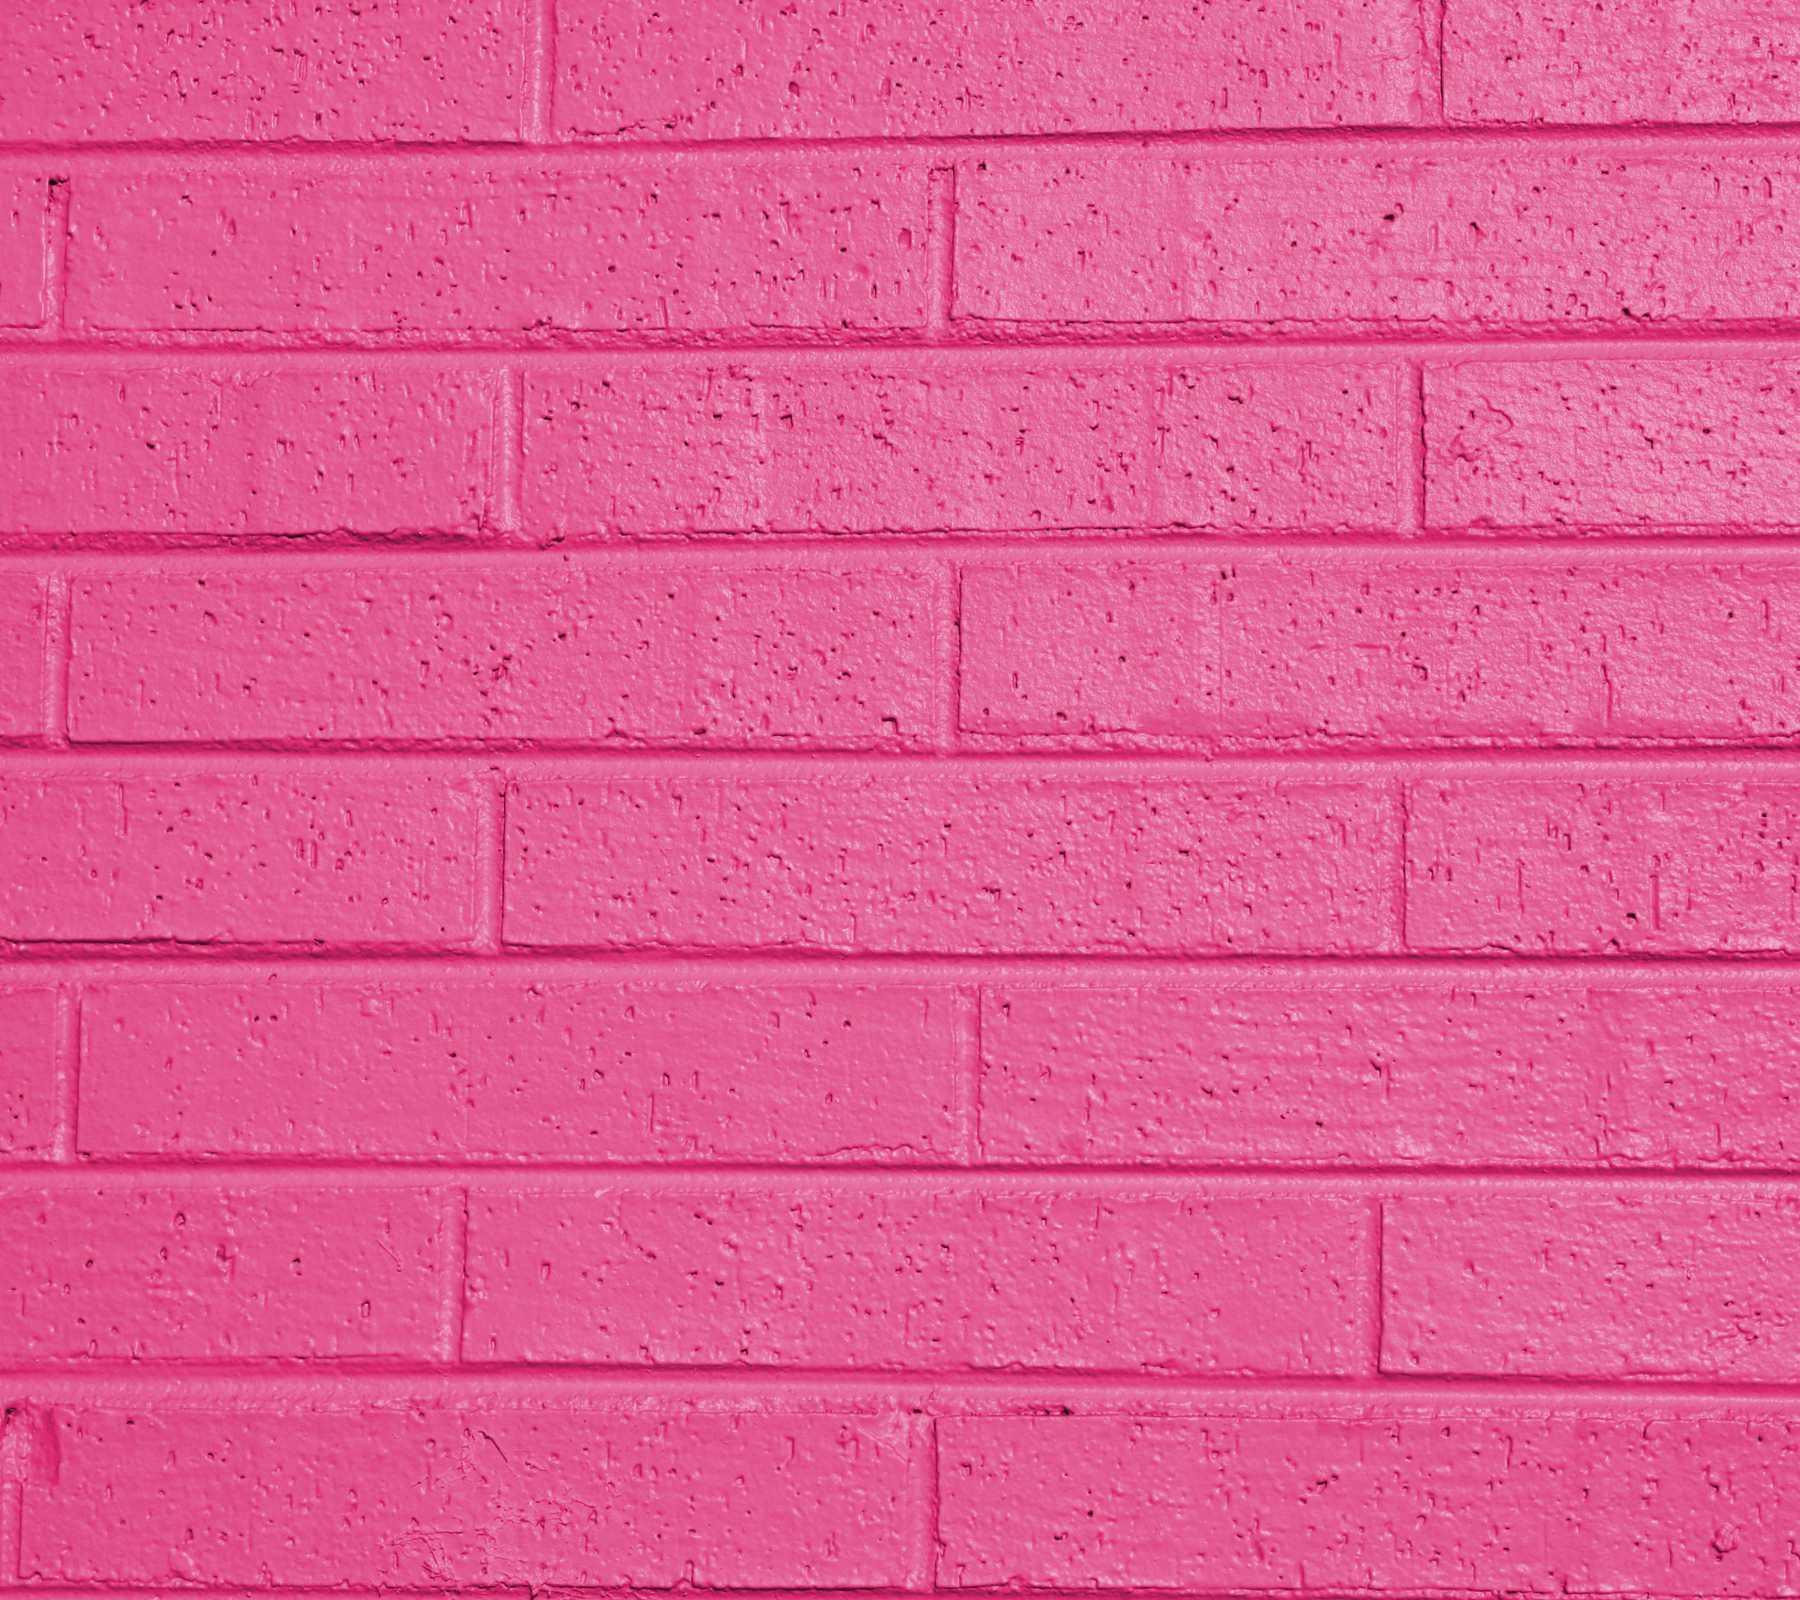 Pink Wallpaper for Walls wallpaper wallpaper hd background desktop 1800x1600